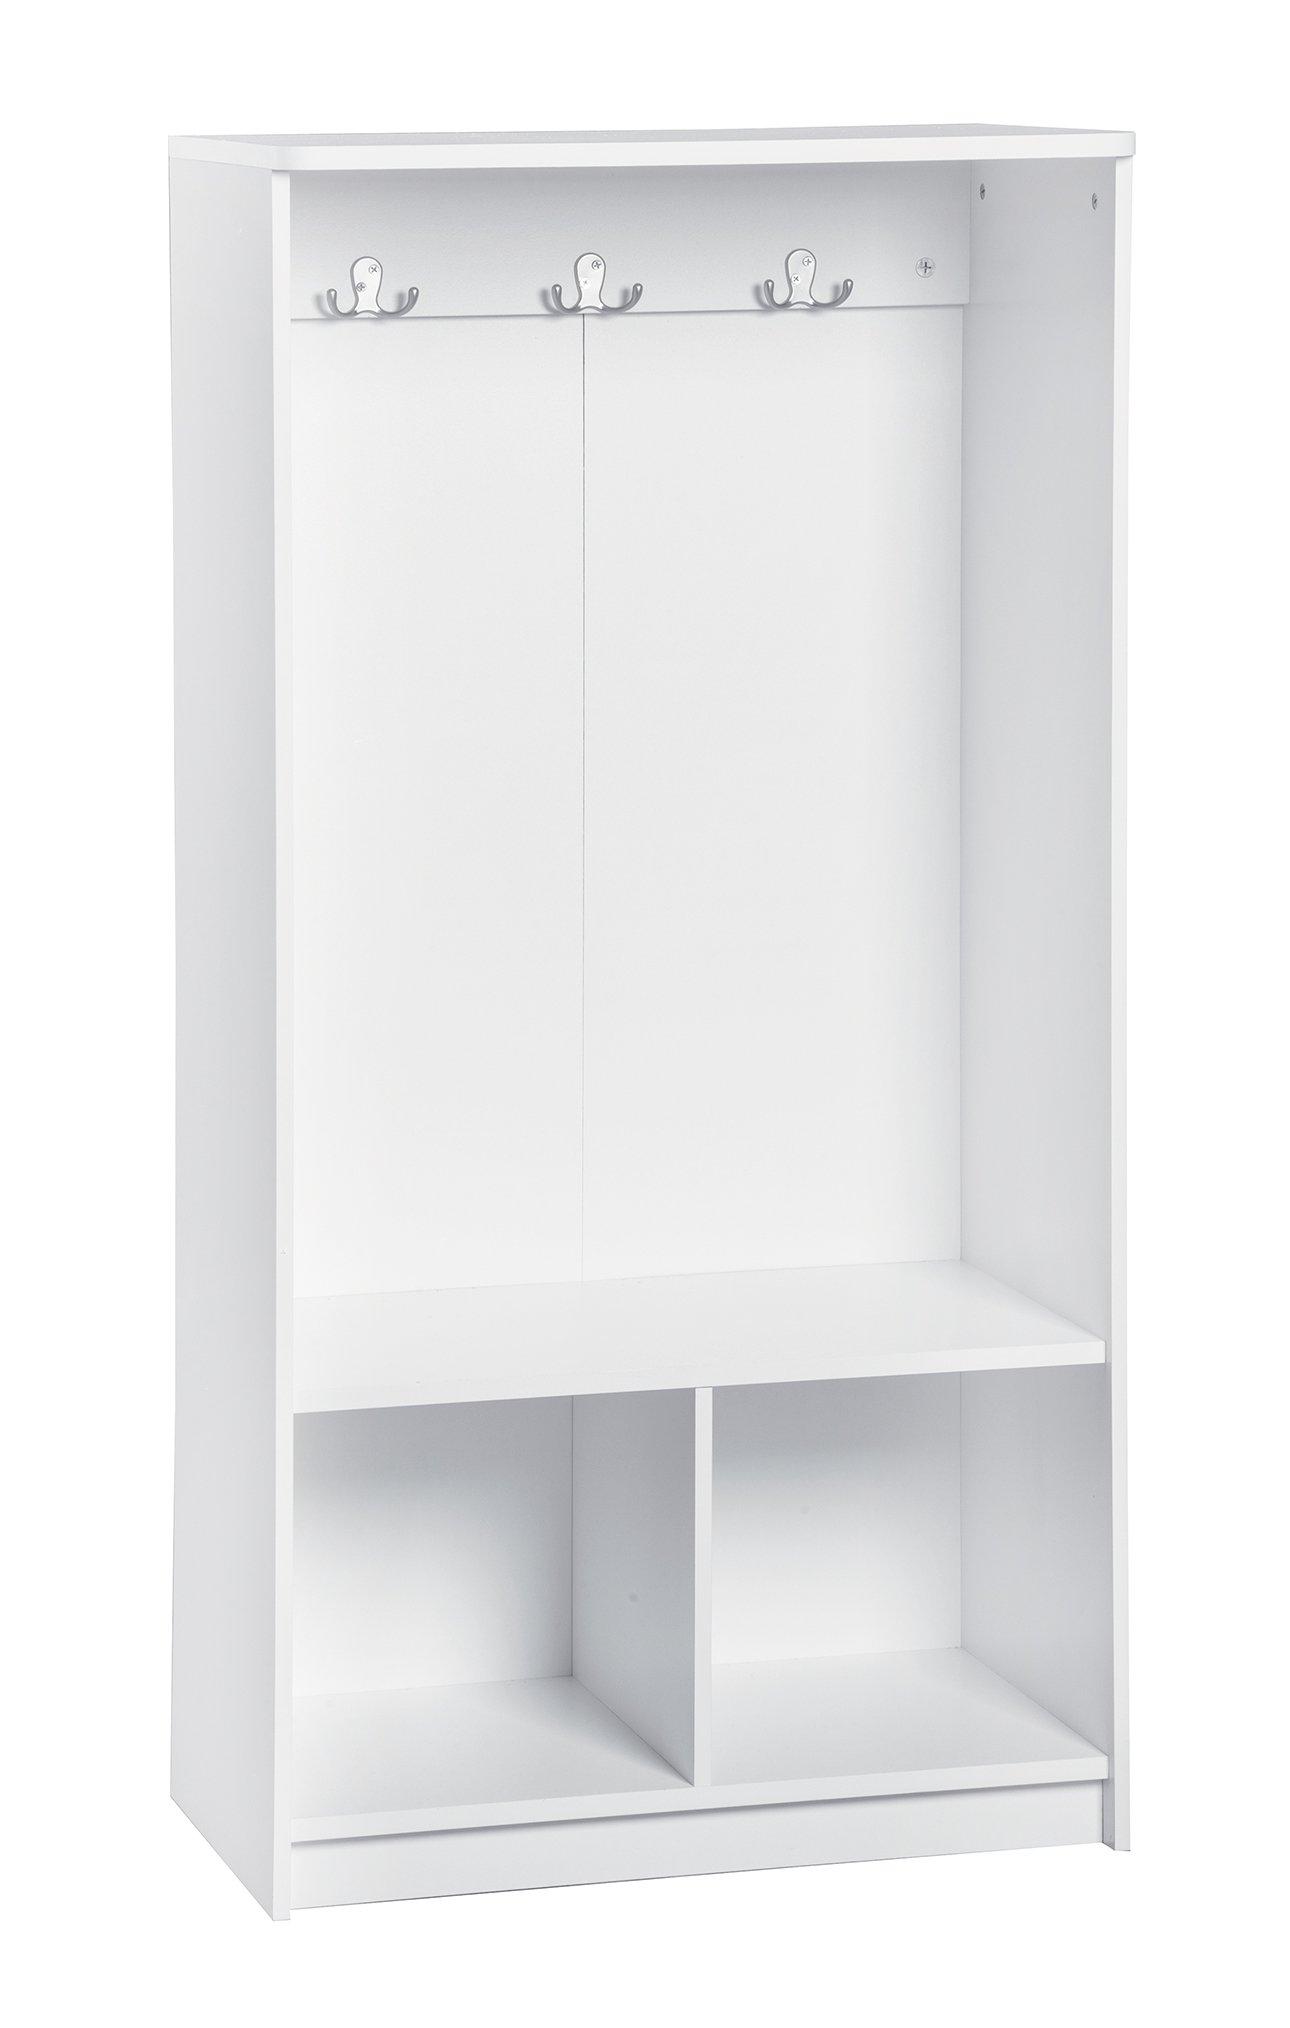 ClosetMaid 1499 KidSpace Open Storage Locker, 49-Inch Height, White by ClosetMaid